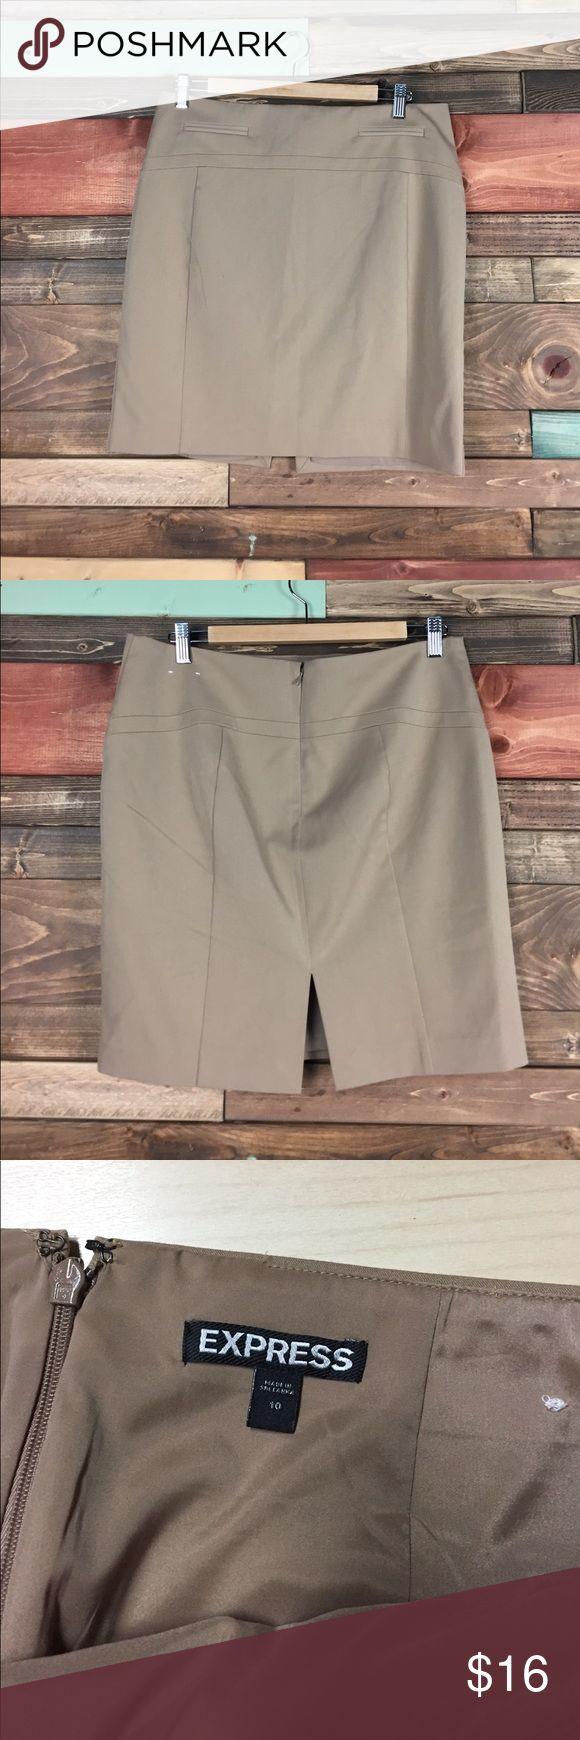 "Express Khaki Pencil Skirt 10 Express Khaki Pencil Skirt 10 // Lined.   // Waist: 17"" laying flat // Length: 18"" Express Skirts"